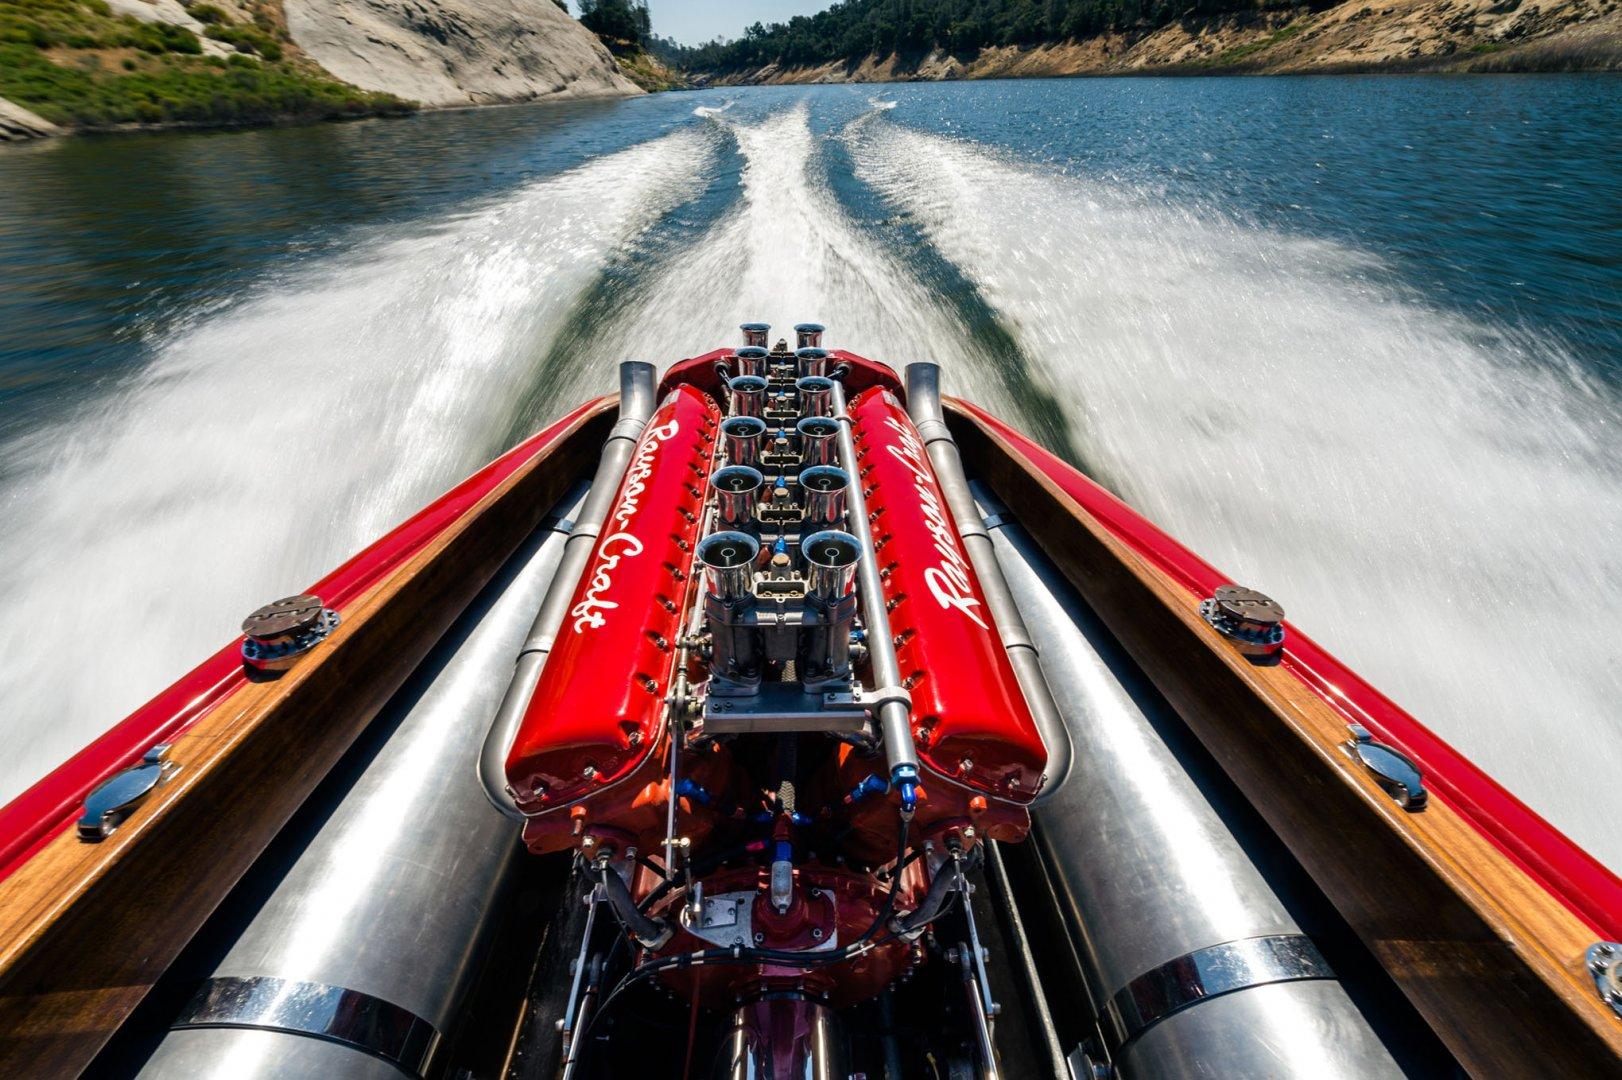 hot-rod-special-cream-puff-marathon-boat-001.jpg